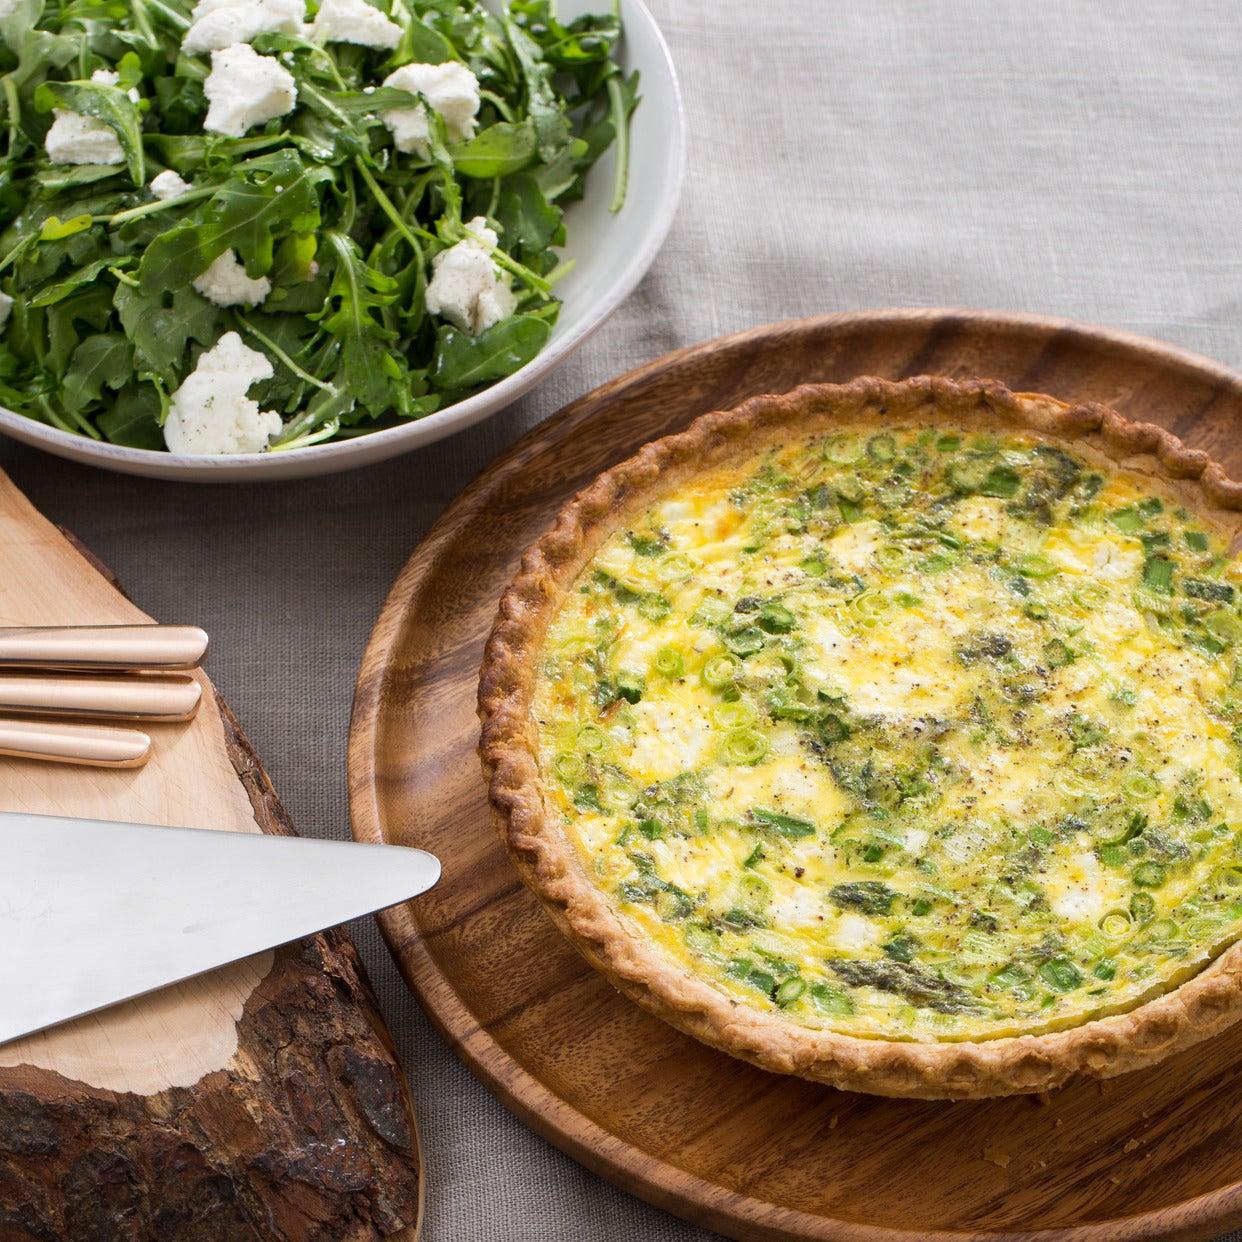 Asparagus & Leek Spring Quiche with Goat Cheese & Arugula Salad